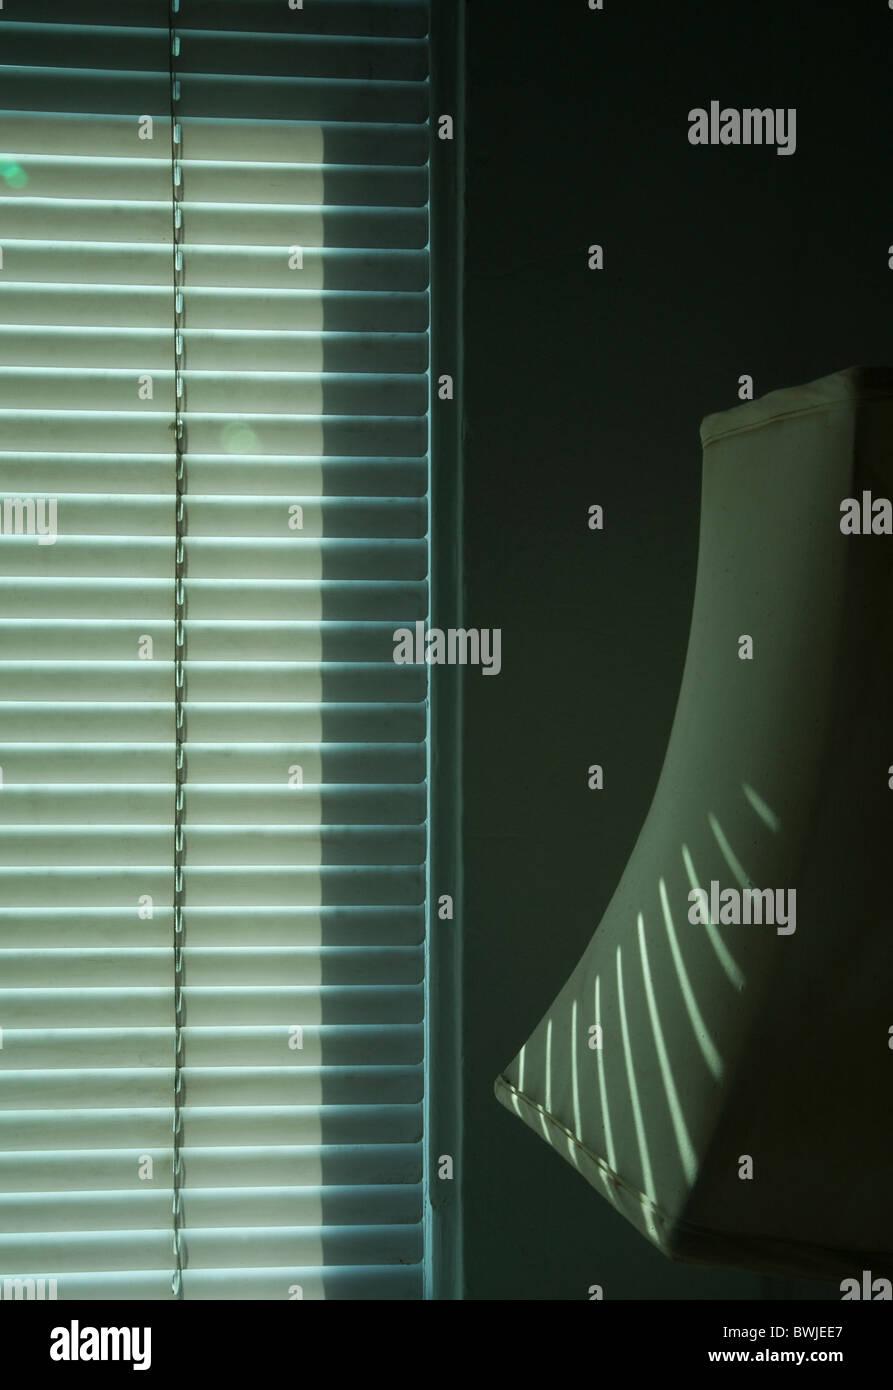 lampshade, window blinds, graphic, monochromatic, interior, sunlight, stripes, interior view of window - Stock Image